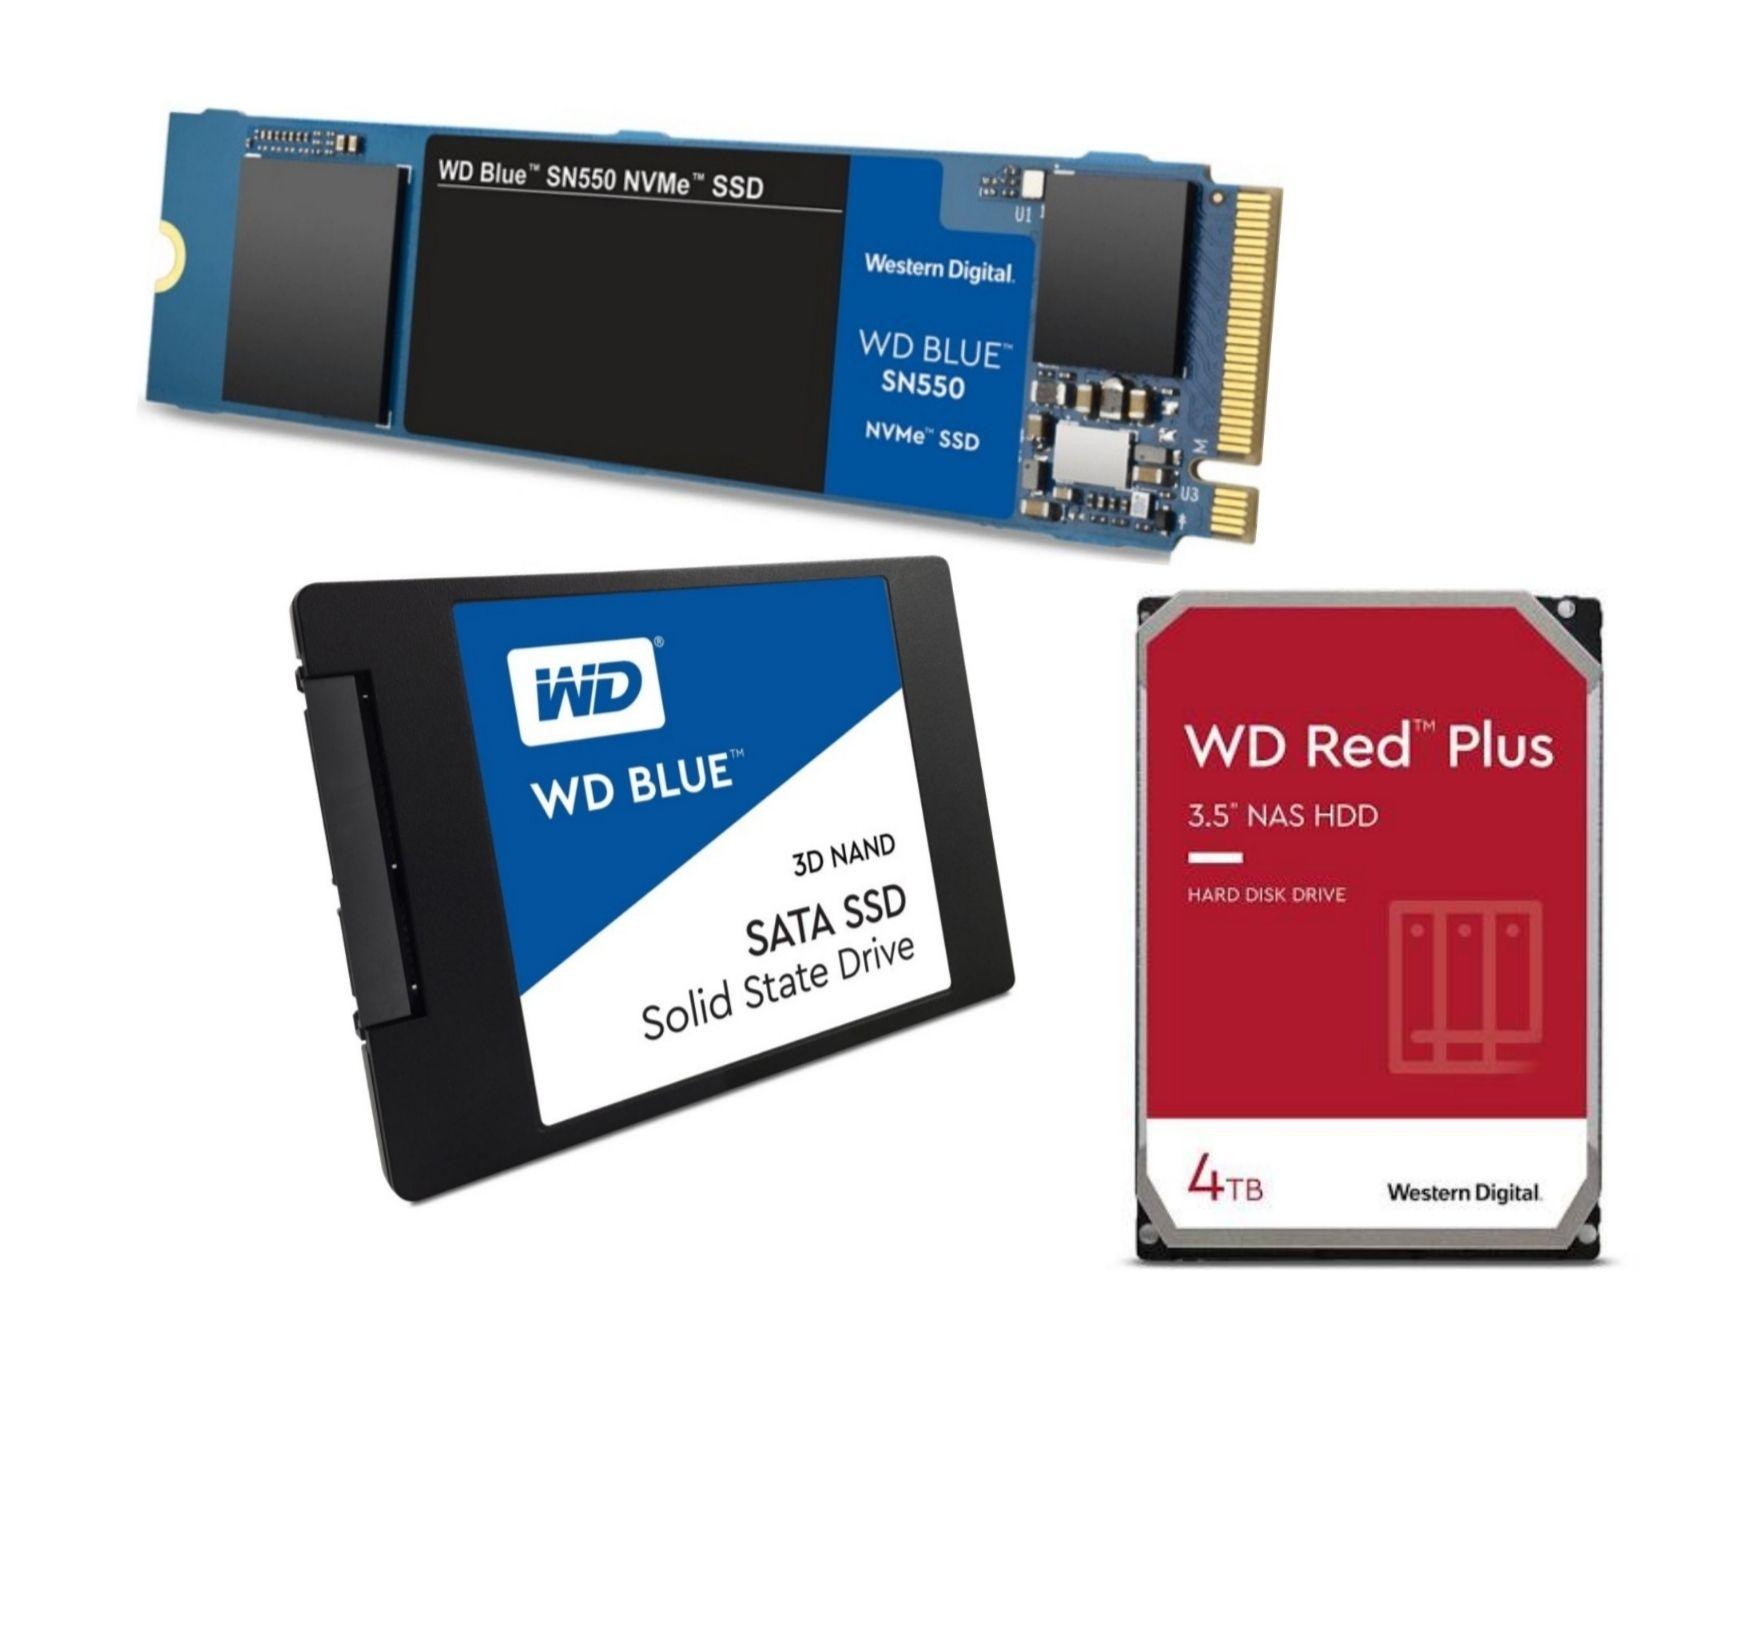 "WD Blue SN550 1TB M.2 NVMe bzw. WD Blue 3D 1TB 2,5"" SATA SSD für jeweils 84,90€ inkl. Versand / 2x4TB WD Red Plus NAS HDD für 184€ inkl."